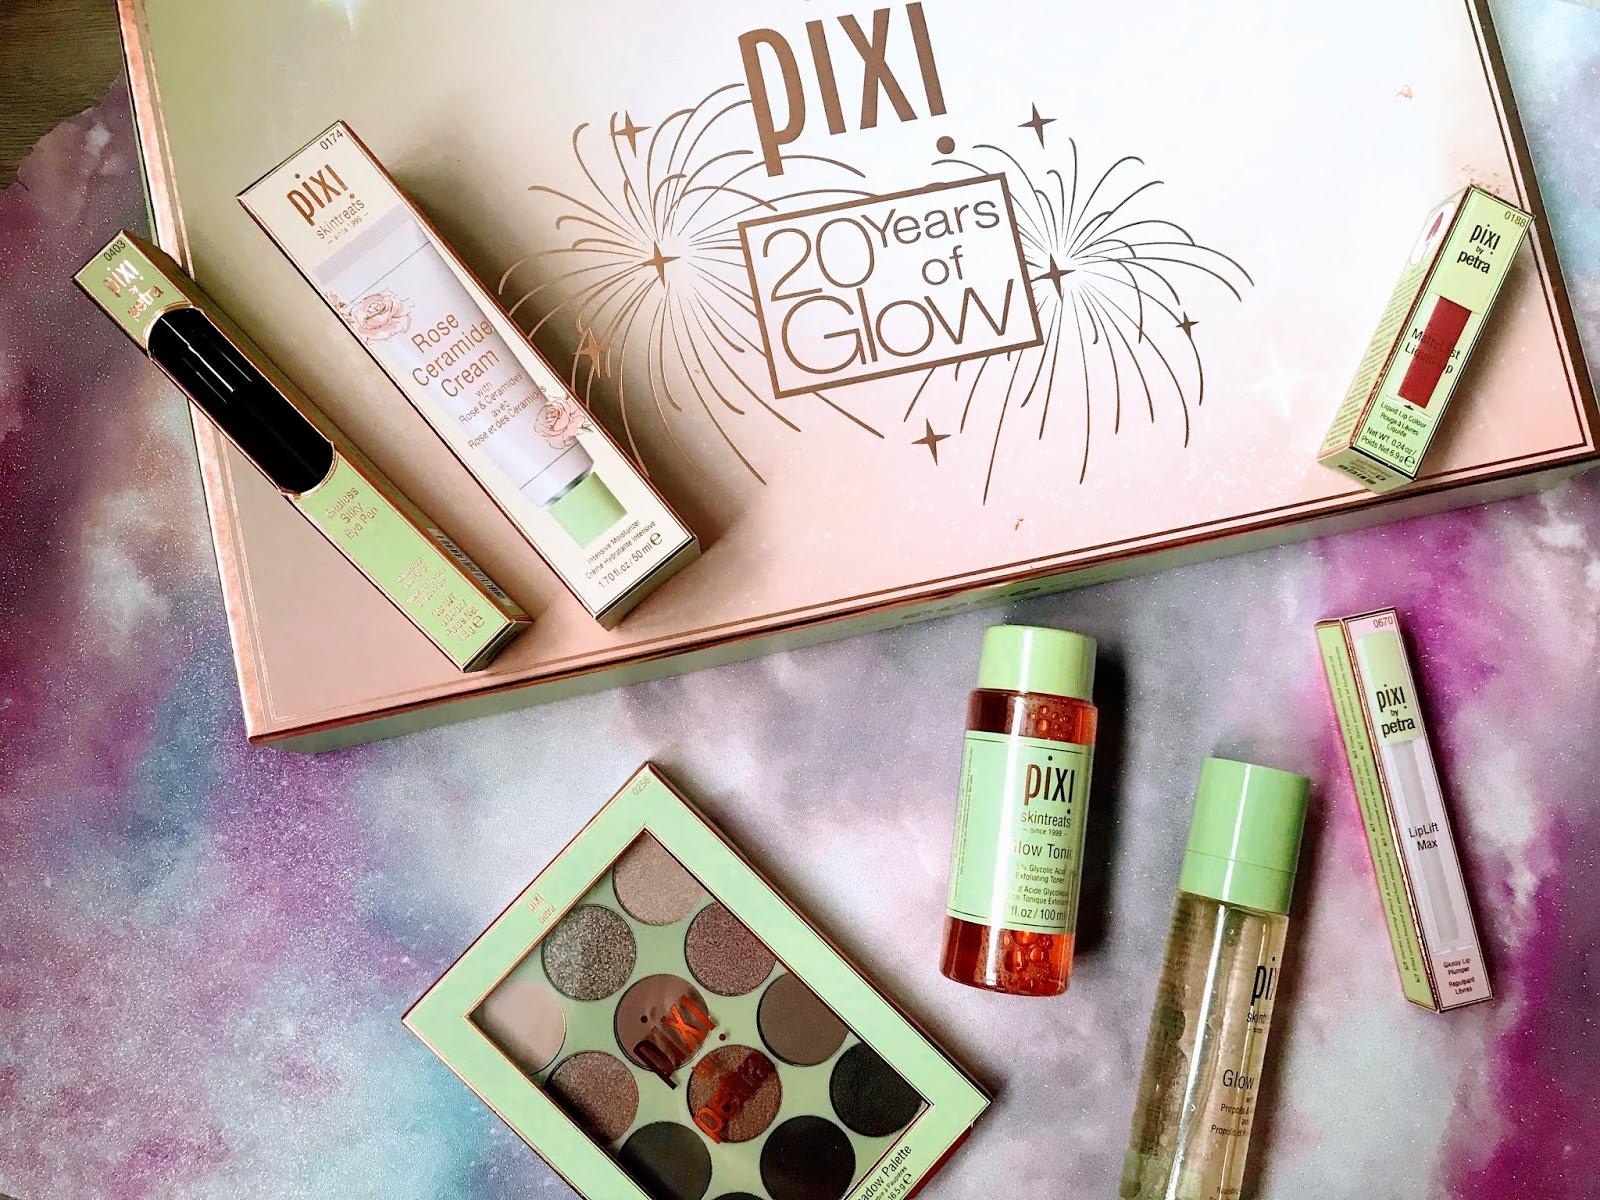 Pixi Beauty - Celebrating 20 Years of Glow